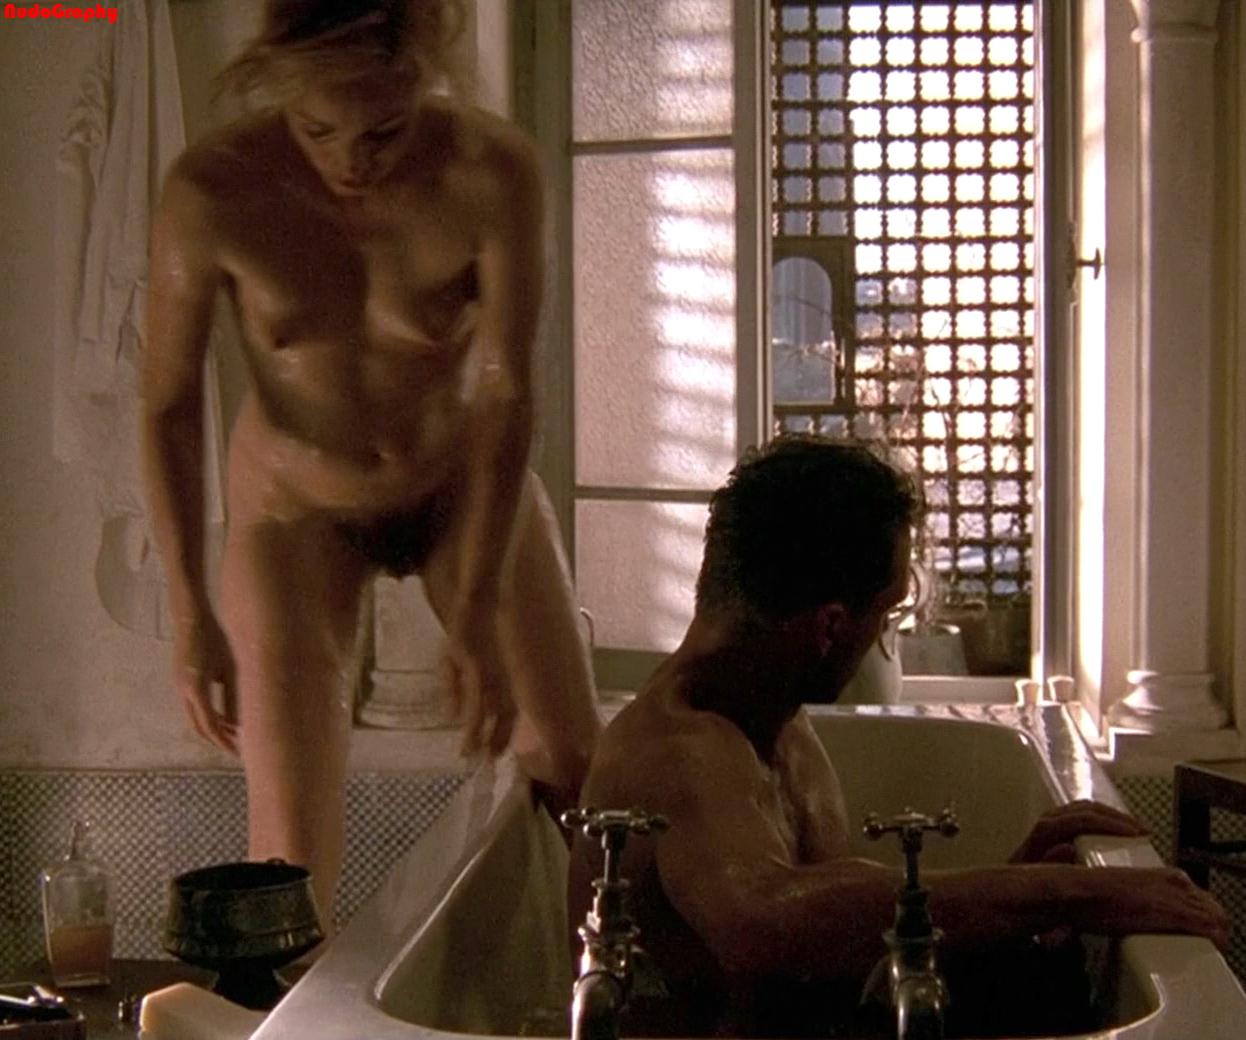 Scott naked kristin